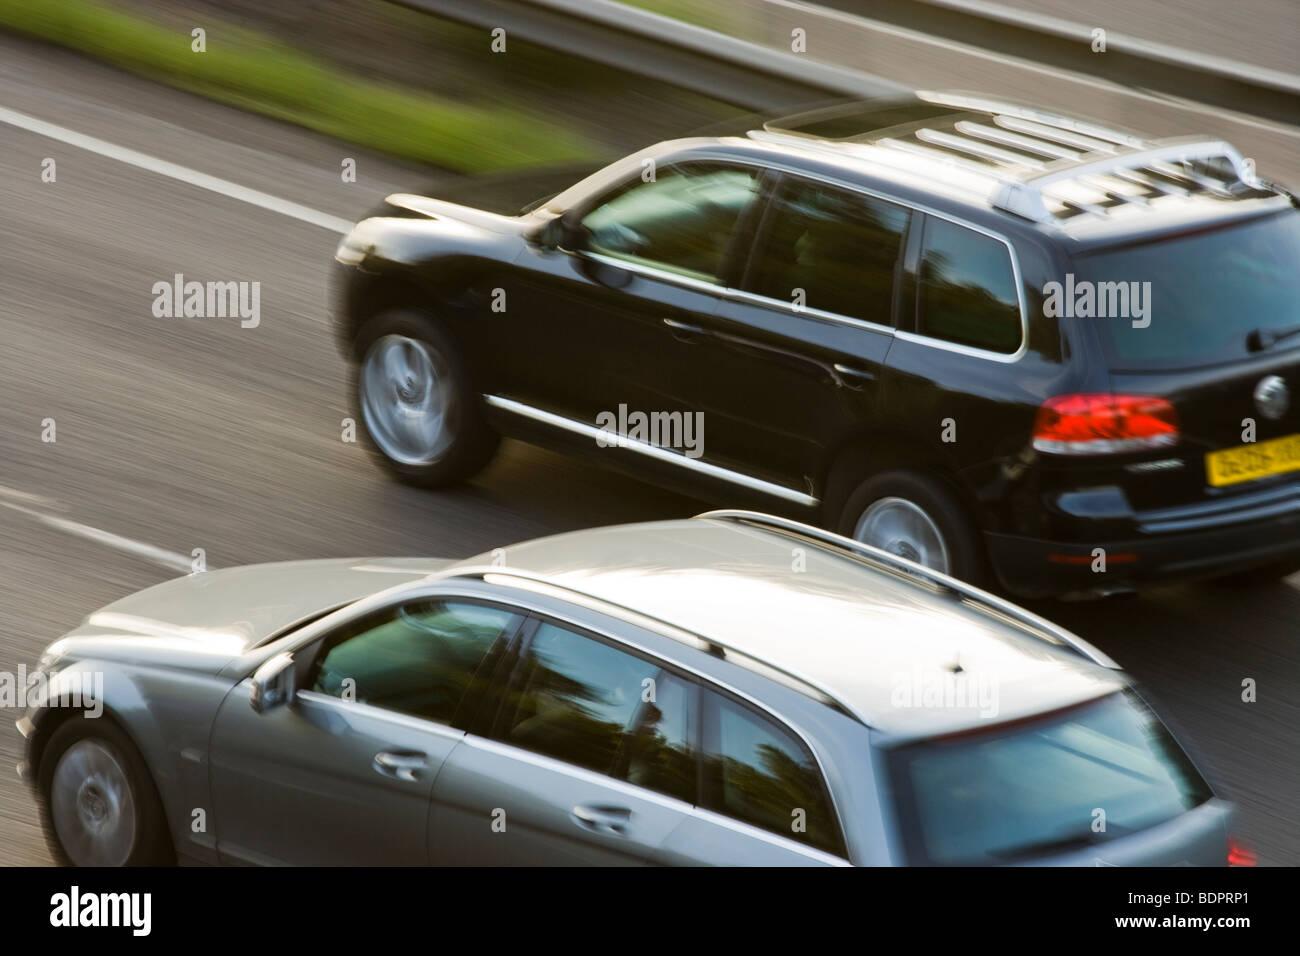 Voitures sur autoroute. UK Photo Stock